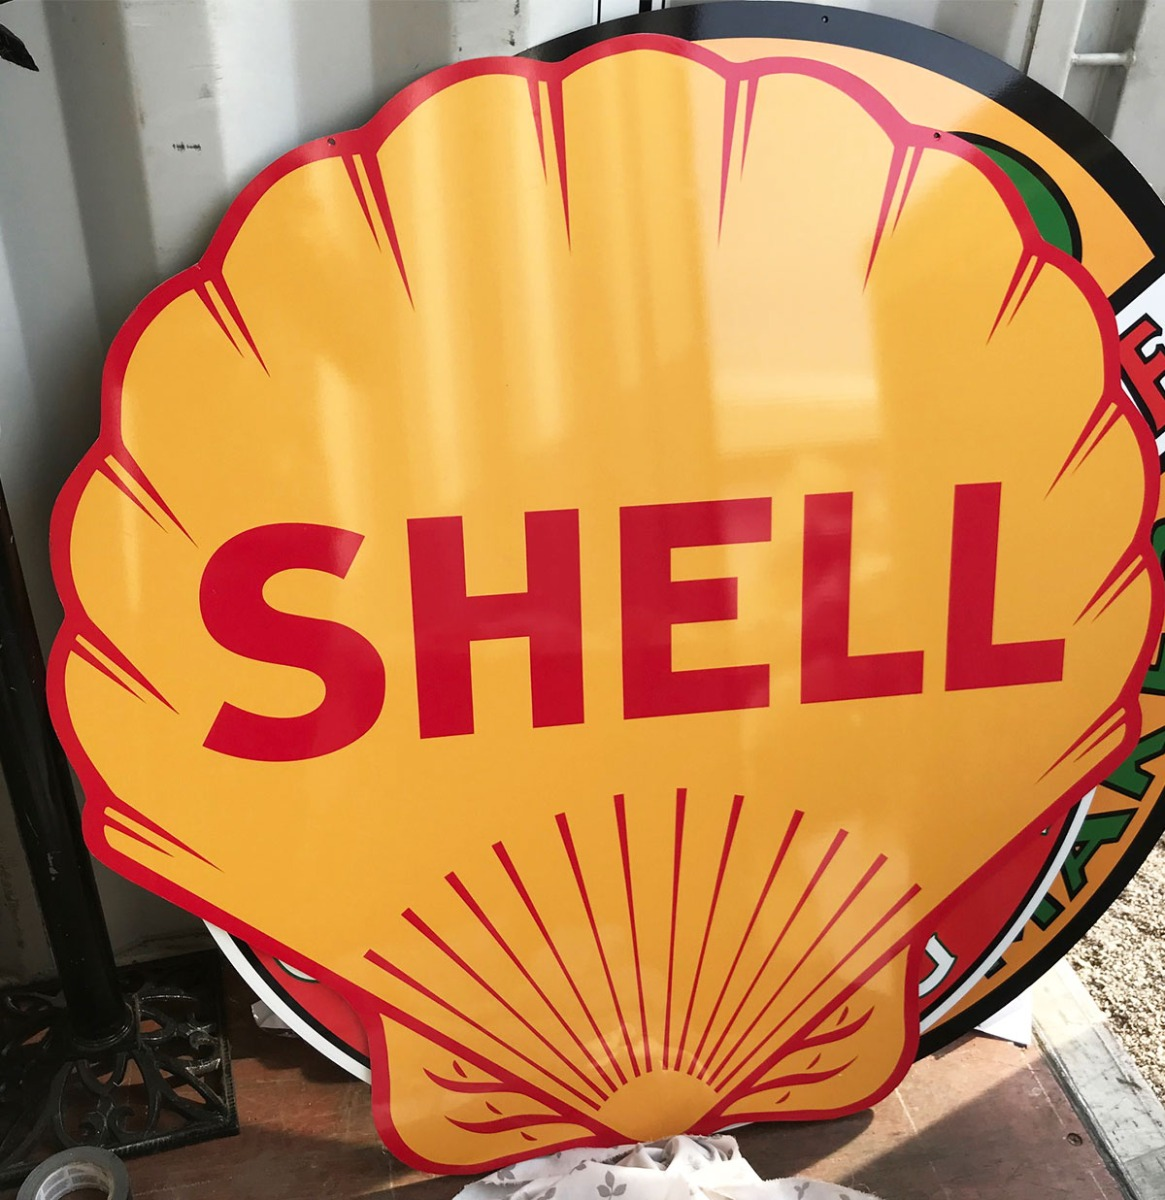 Shell Groot Metalen Bord - Reproductie